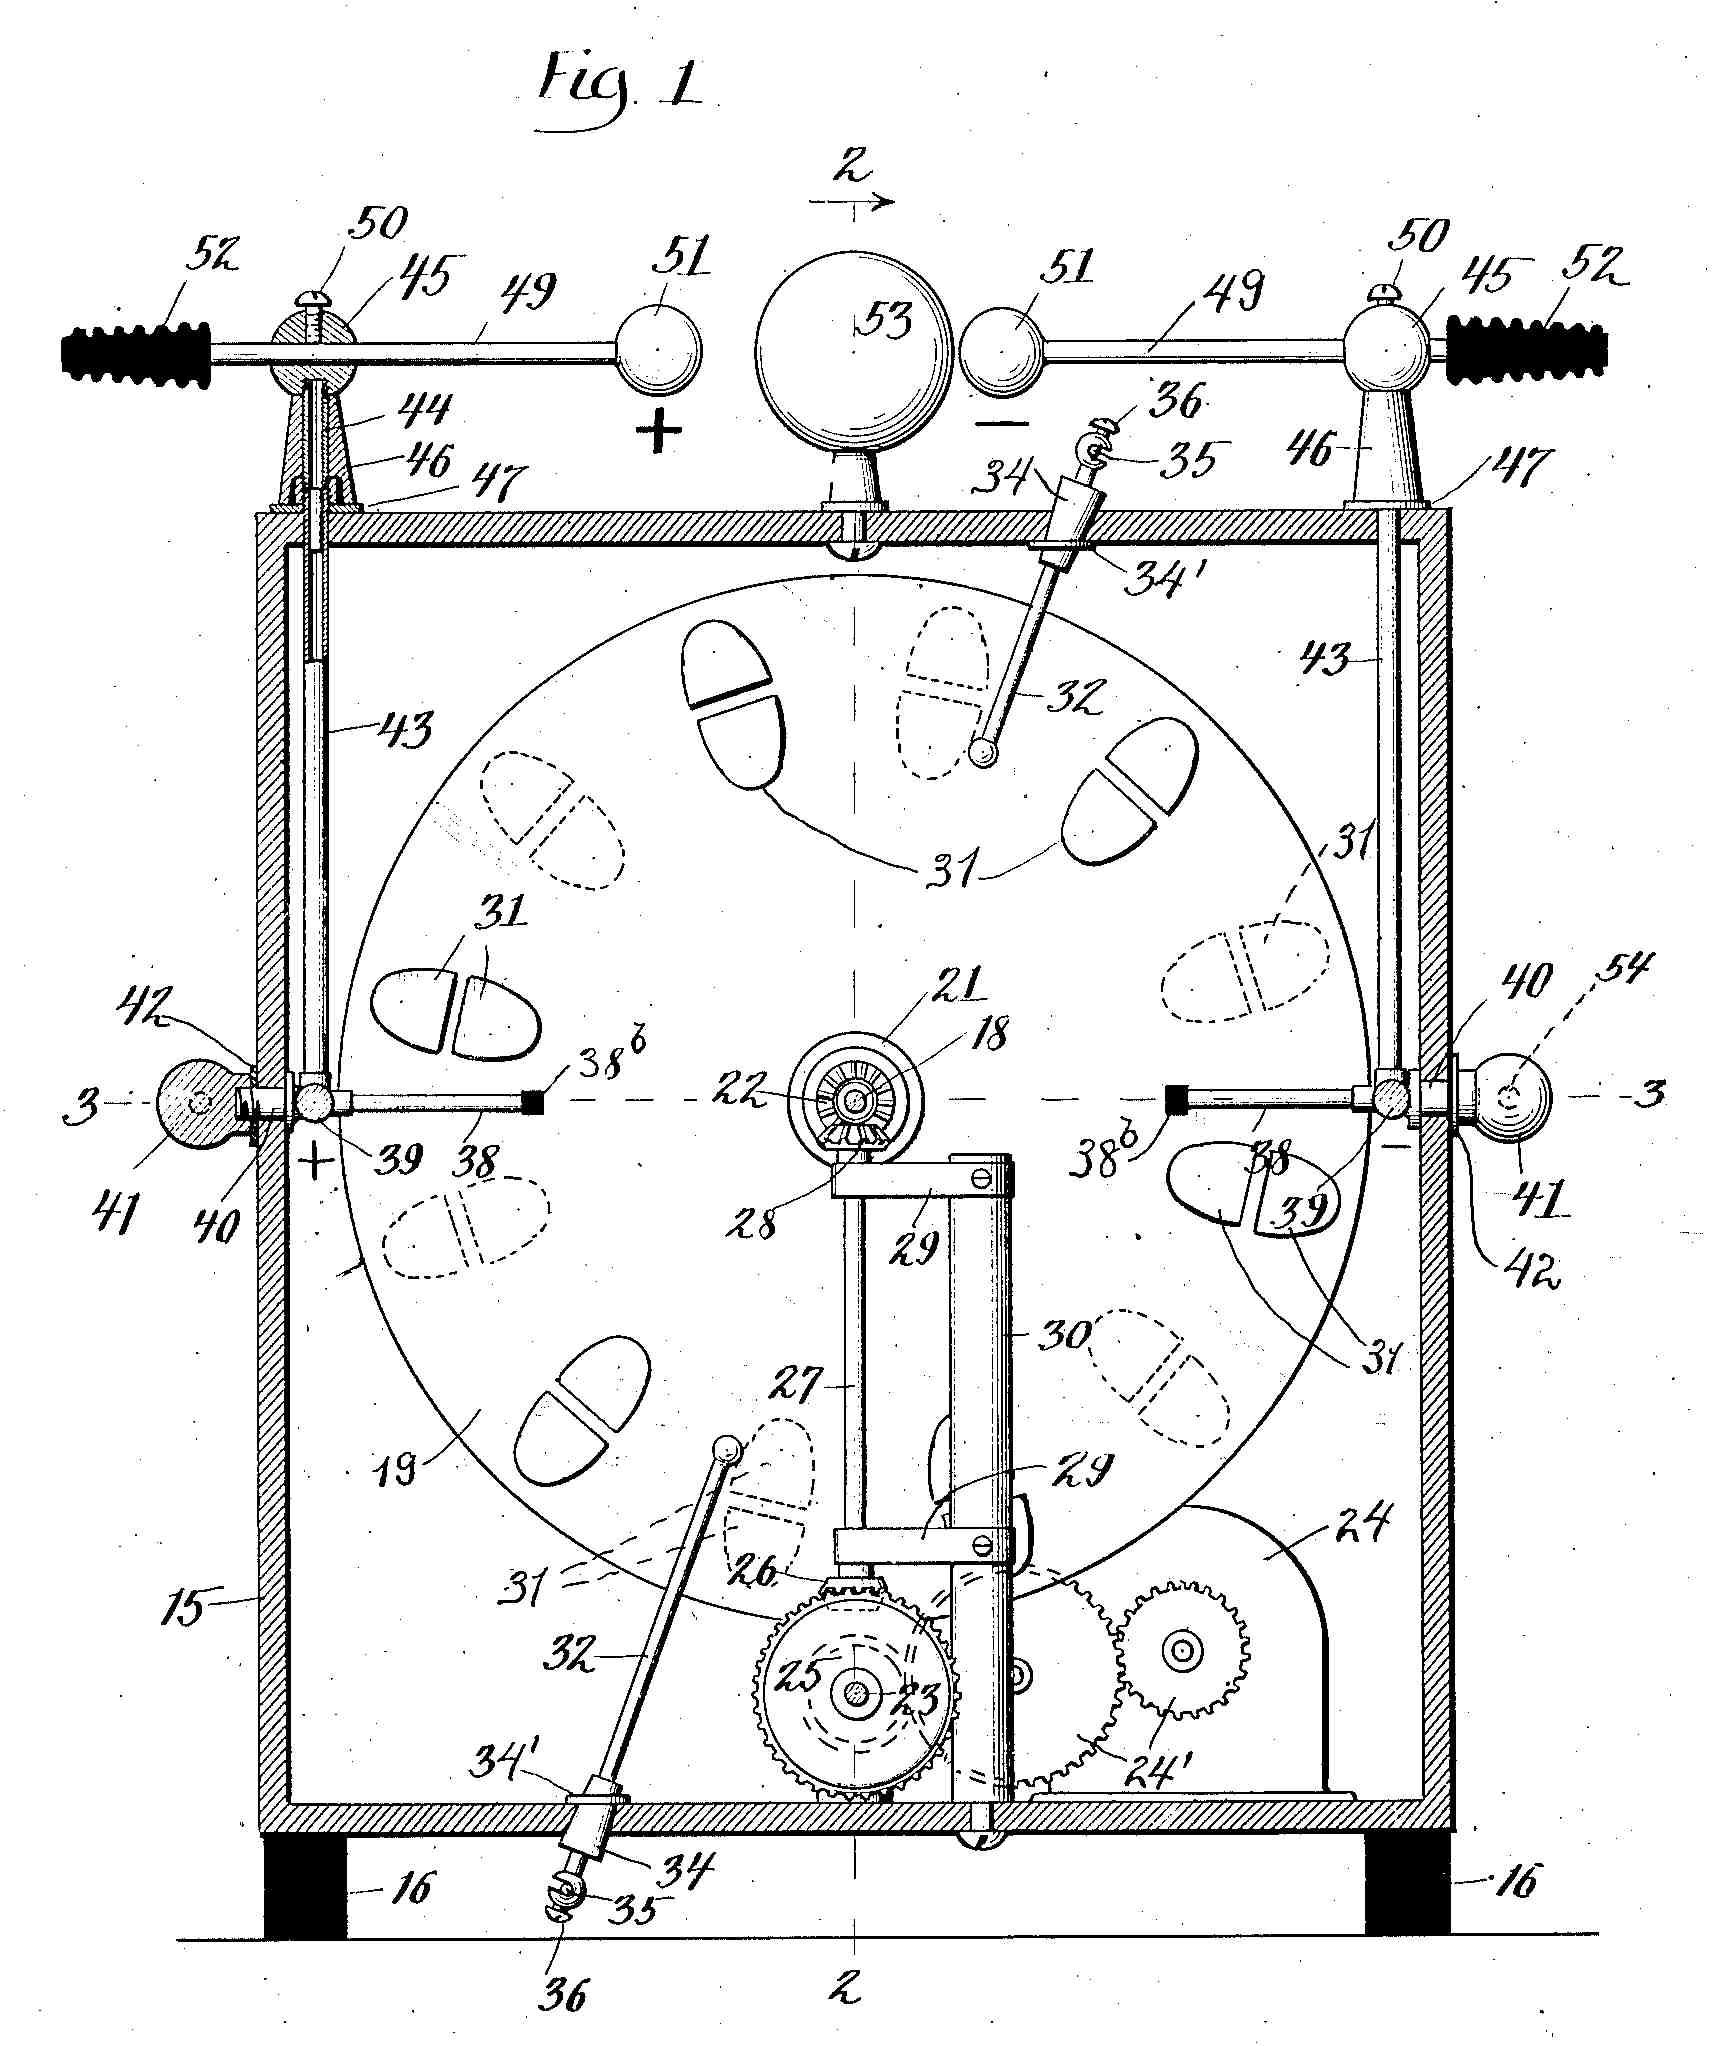 Advanced Stellar Propulsion Systems 1956 Bel Air Heater Wiring Diagram Piggotoverview Rexresearch 123625 Bytes Piggott Patent Fig1 247814